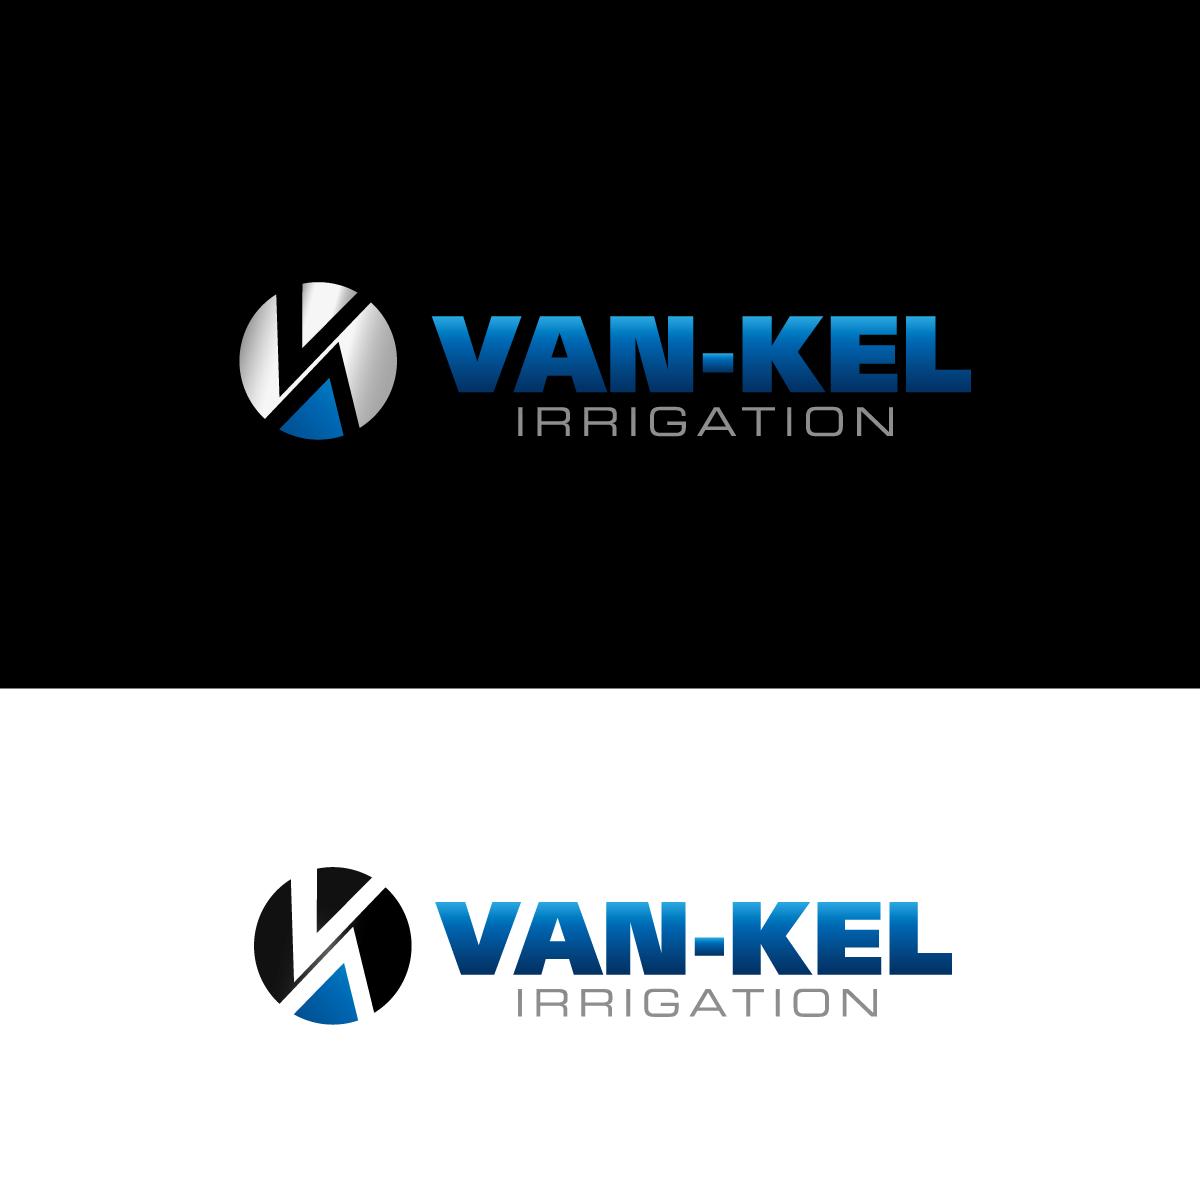 Logo Design by rockin - Entry No. 192 in the Logo Design Contest Van-Kel Irrigation Logo Design.